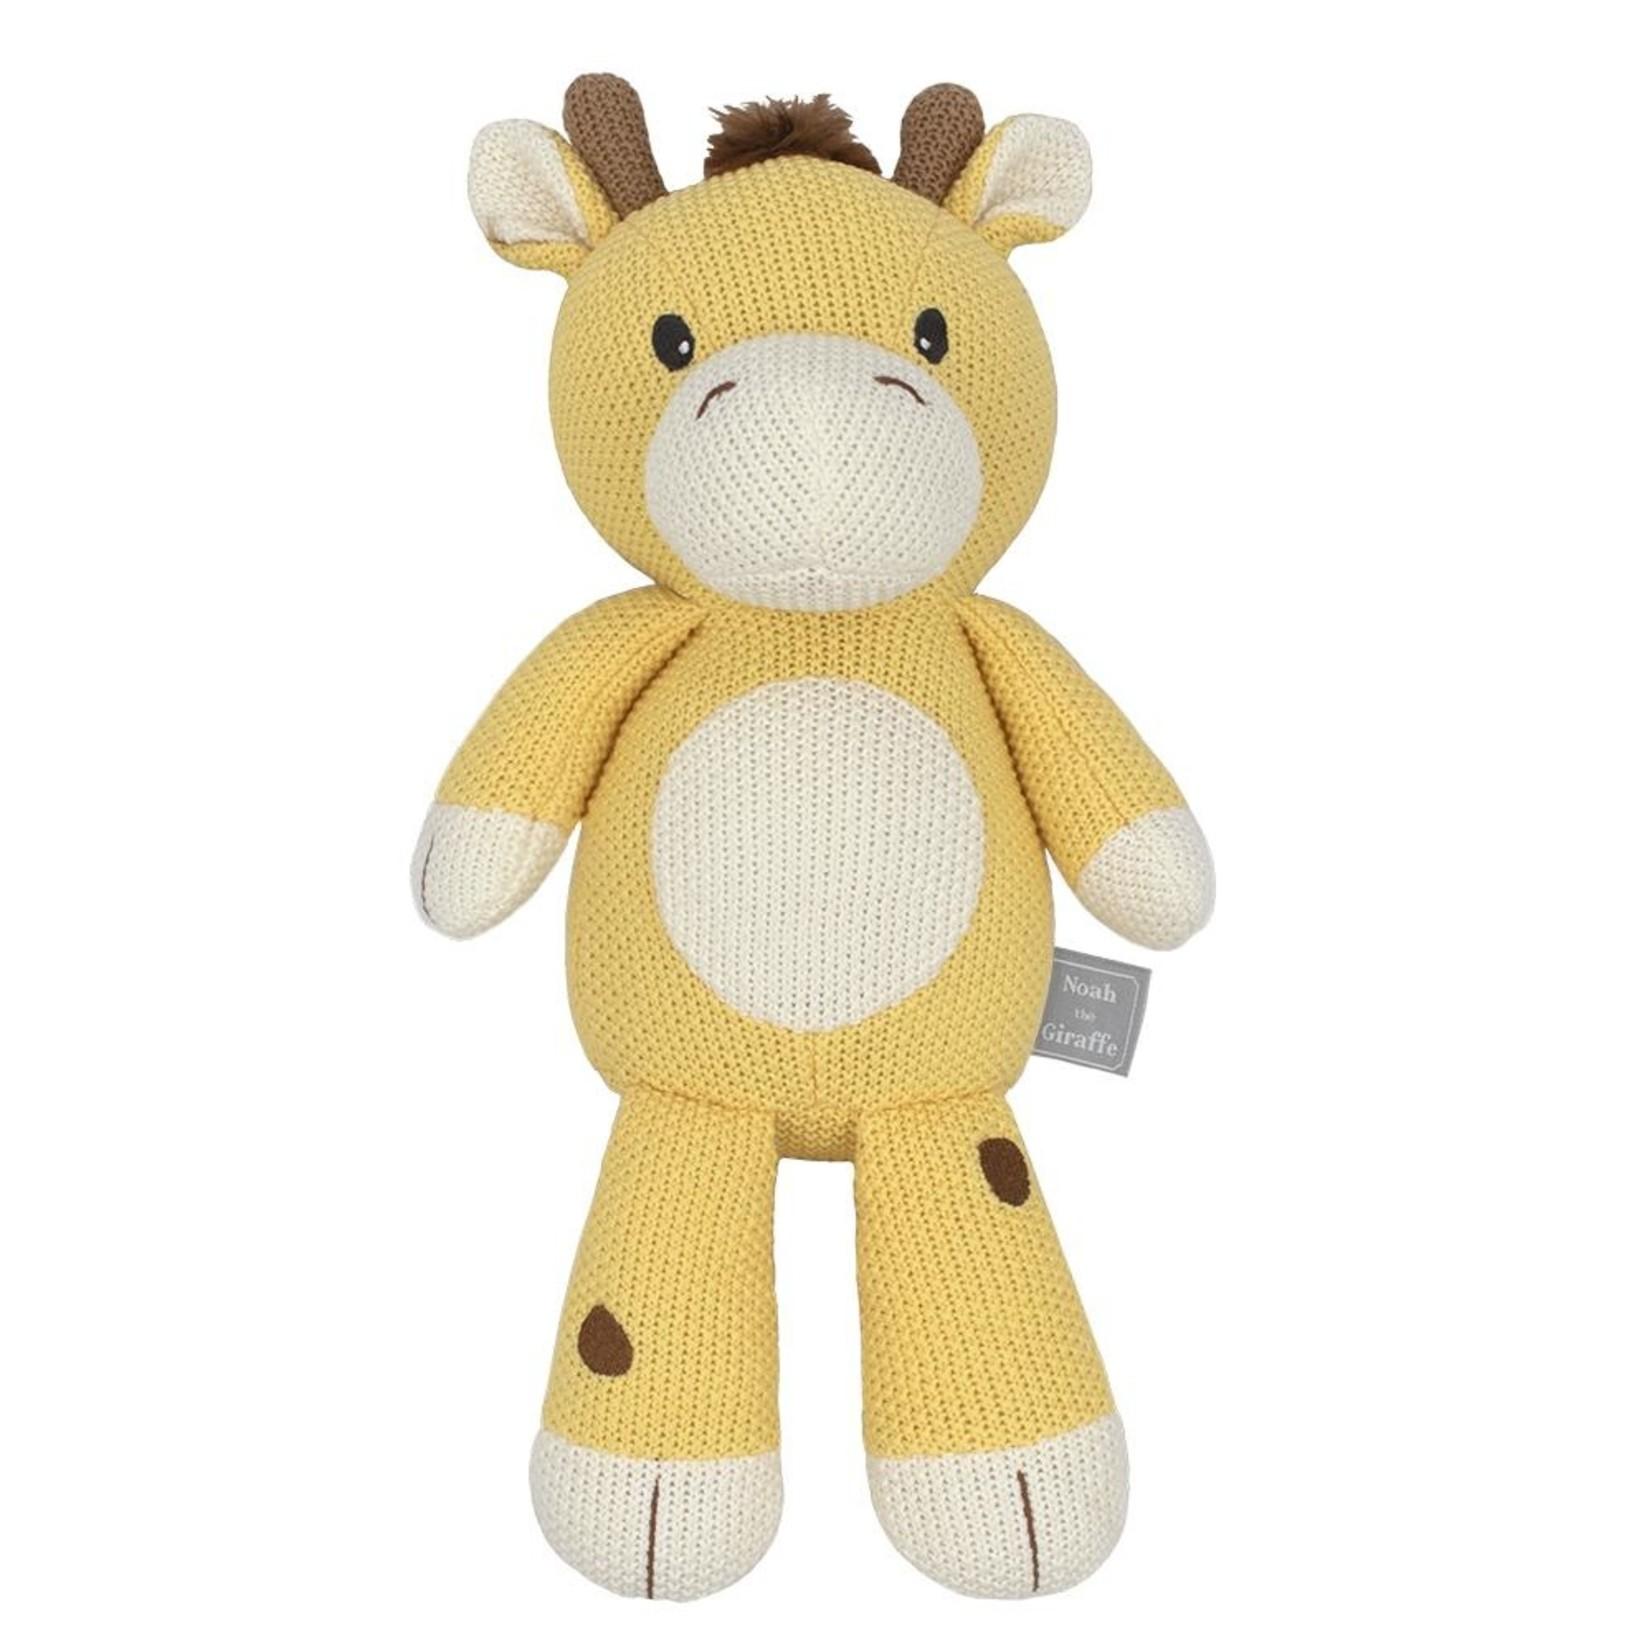 Living Textiles Living Textiles Whimsical Toy - Noah the Giraffe